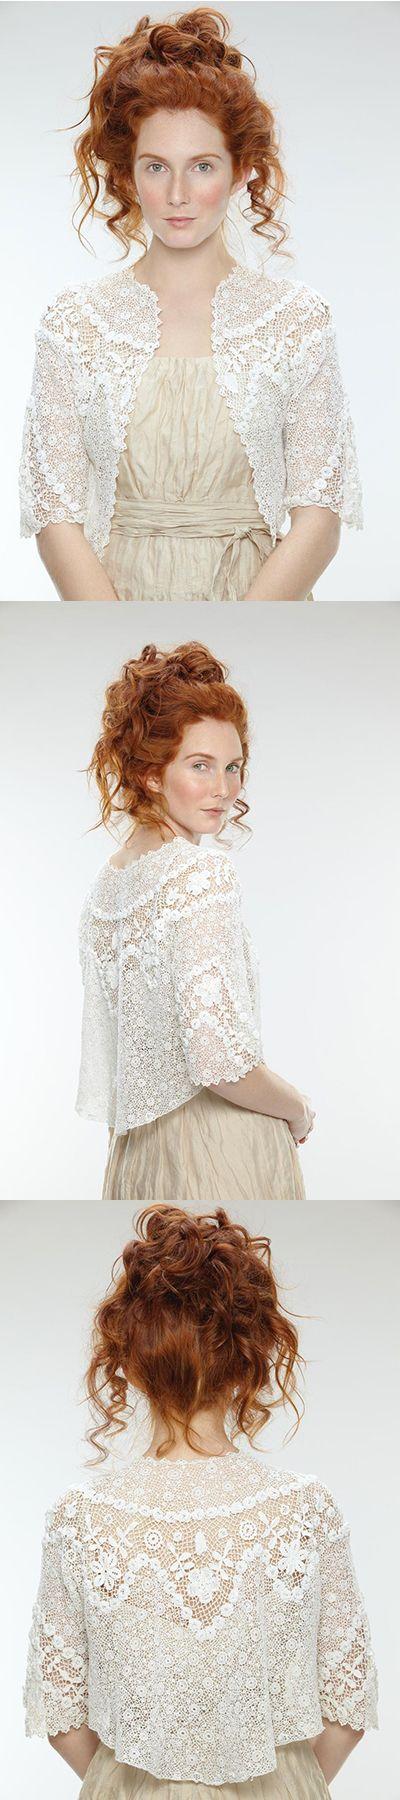 Irish Crochet-This looks so much like I did, it makes me realize how Irish I am!!